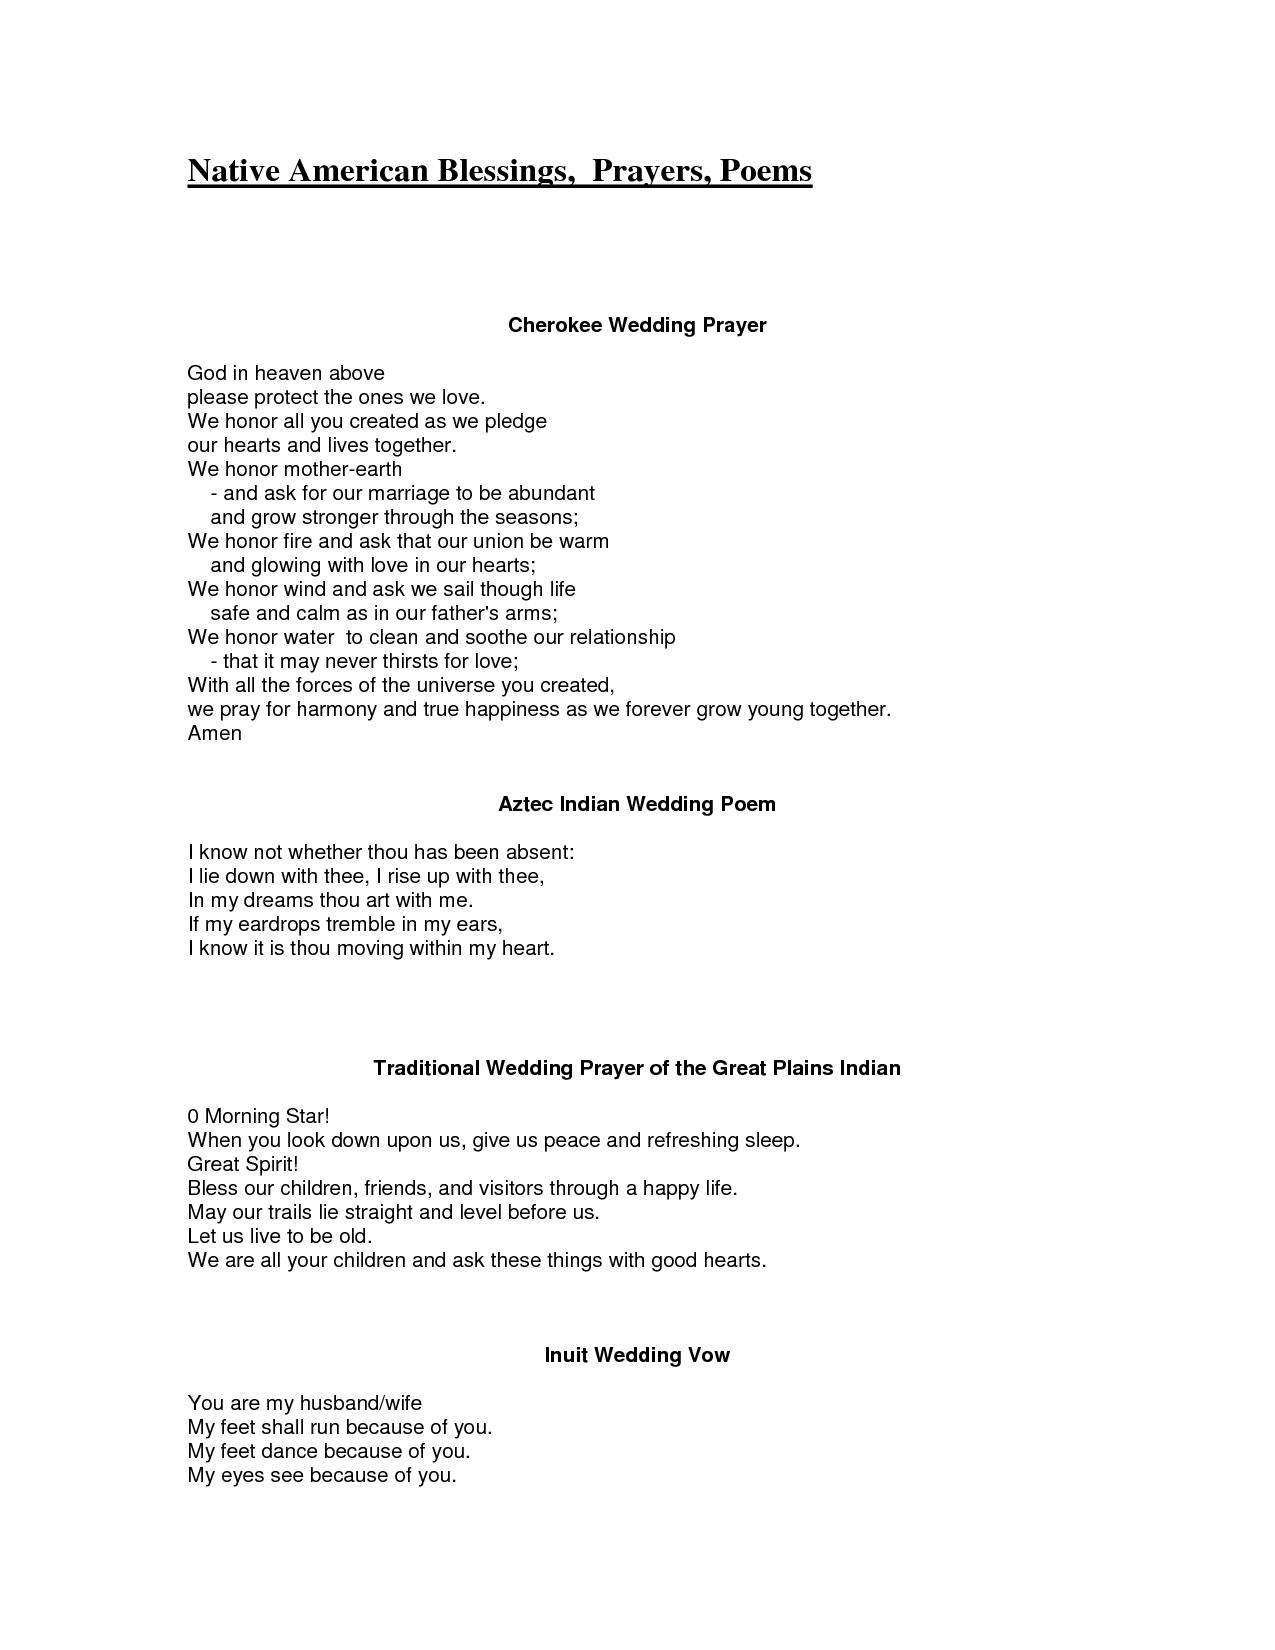 Cherokee Love Poems | cherokee poem. I feel it too | native ...